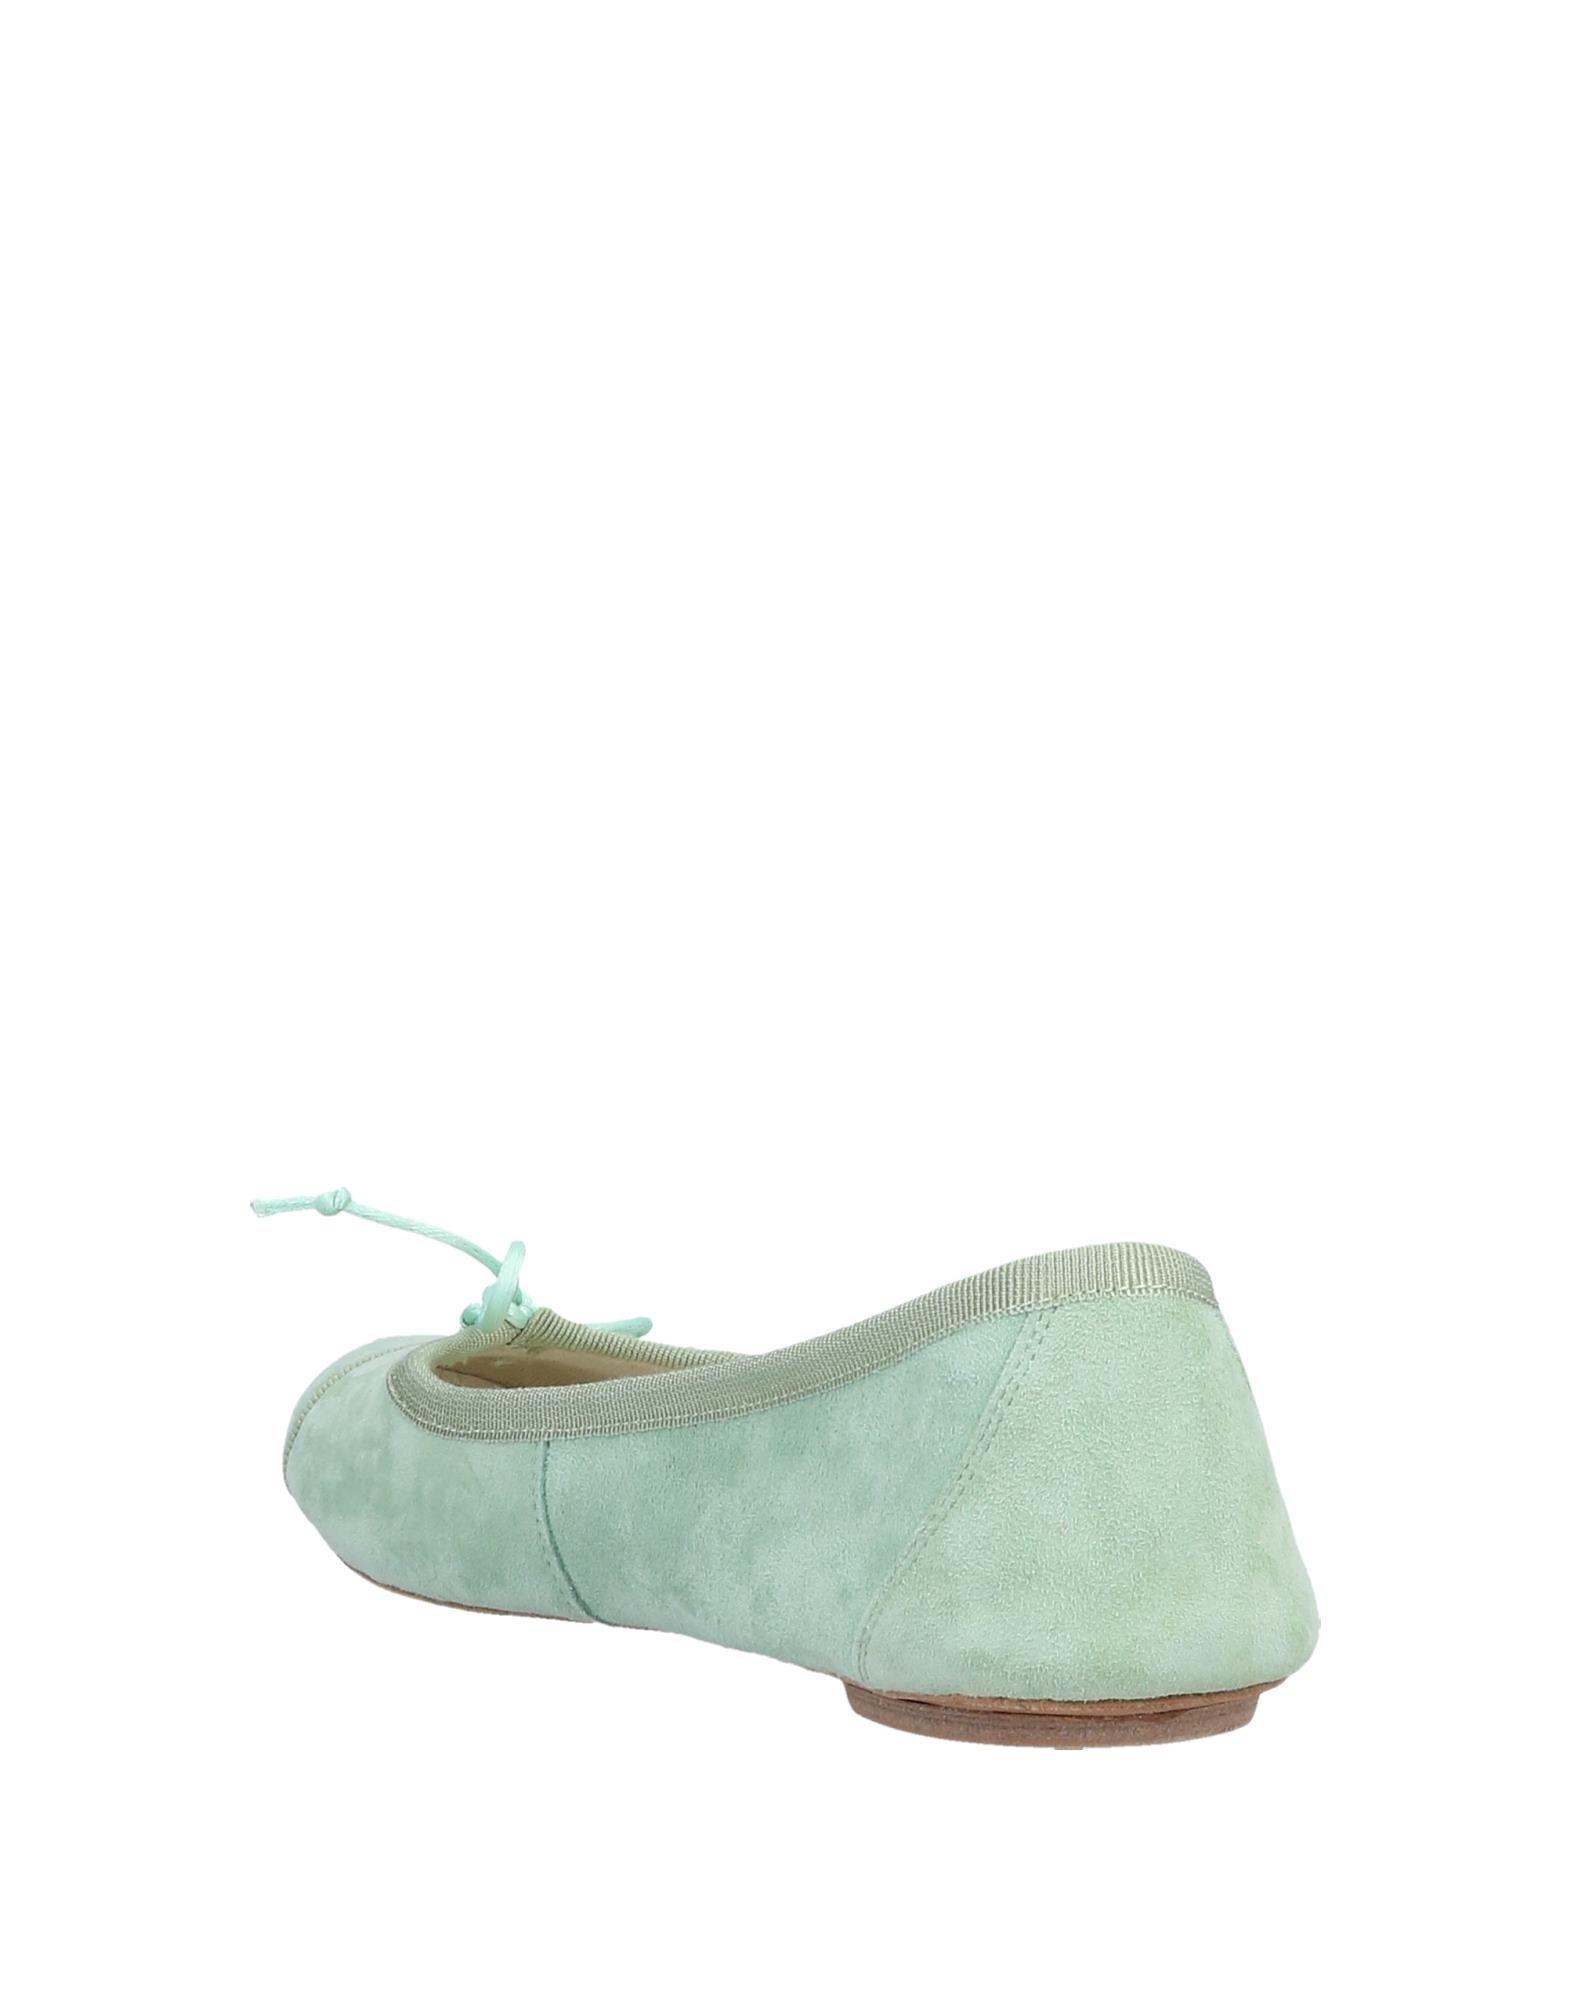 Gielle Ballerinas beliebte Damen 11565575CS Gute Qualität beliebte Ballerinas Schuhe 739803